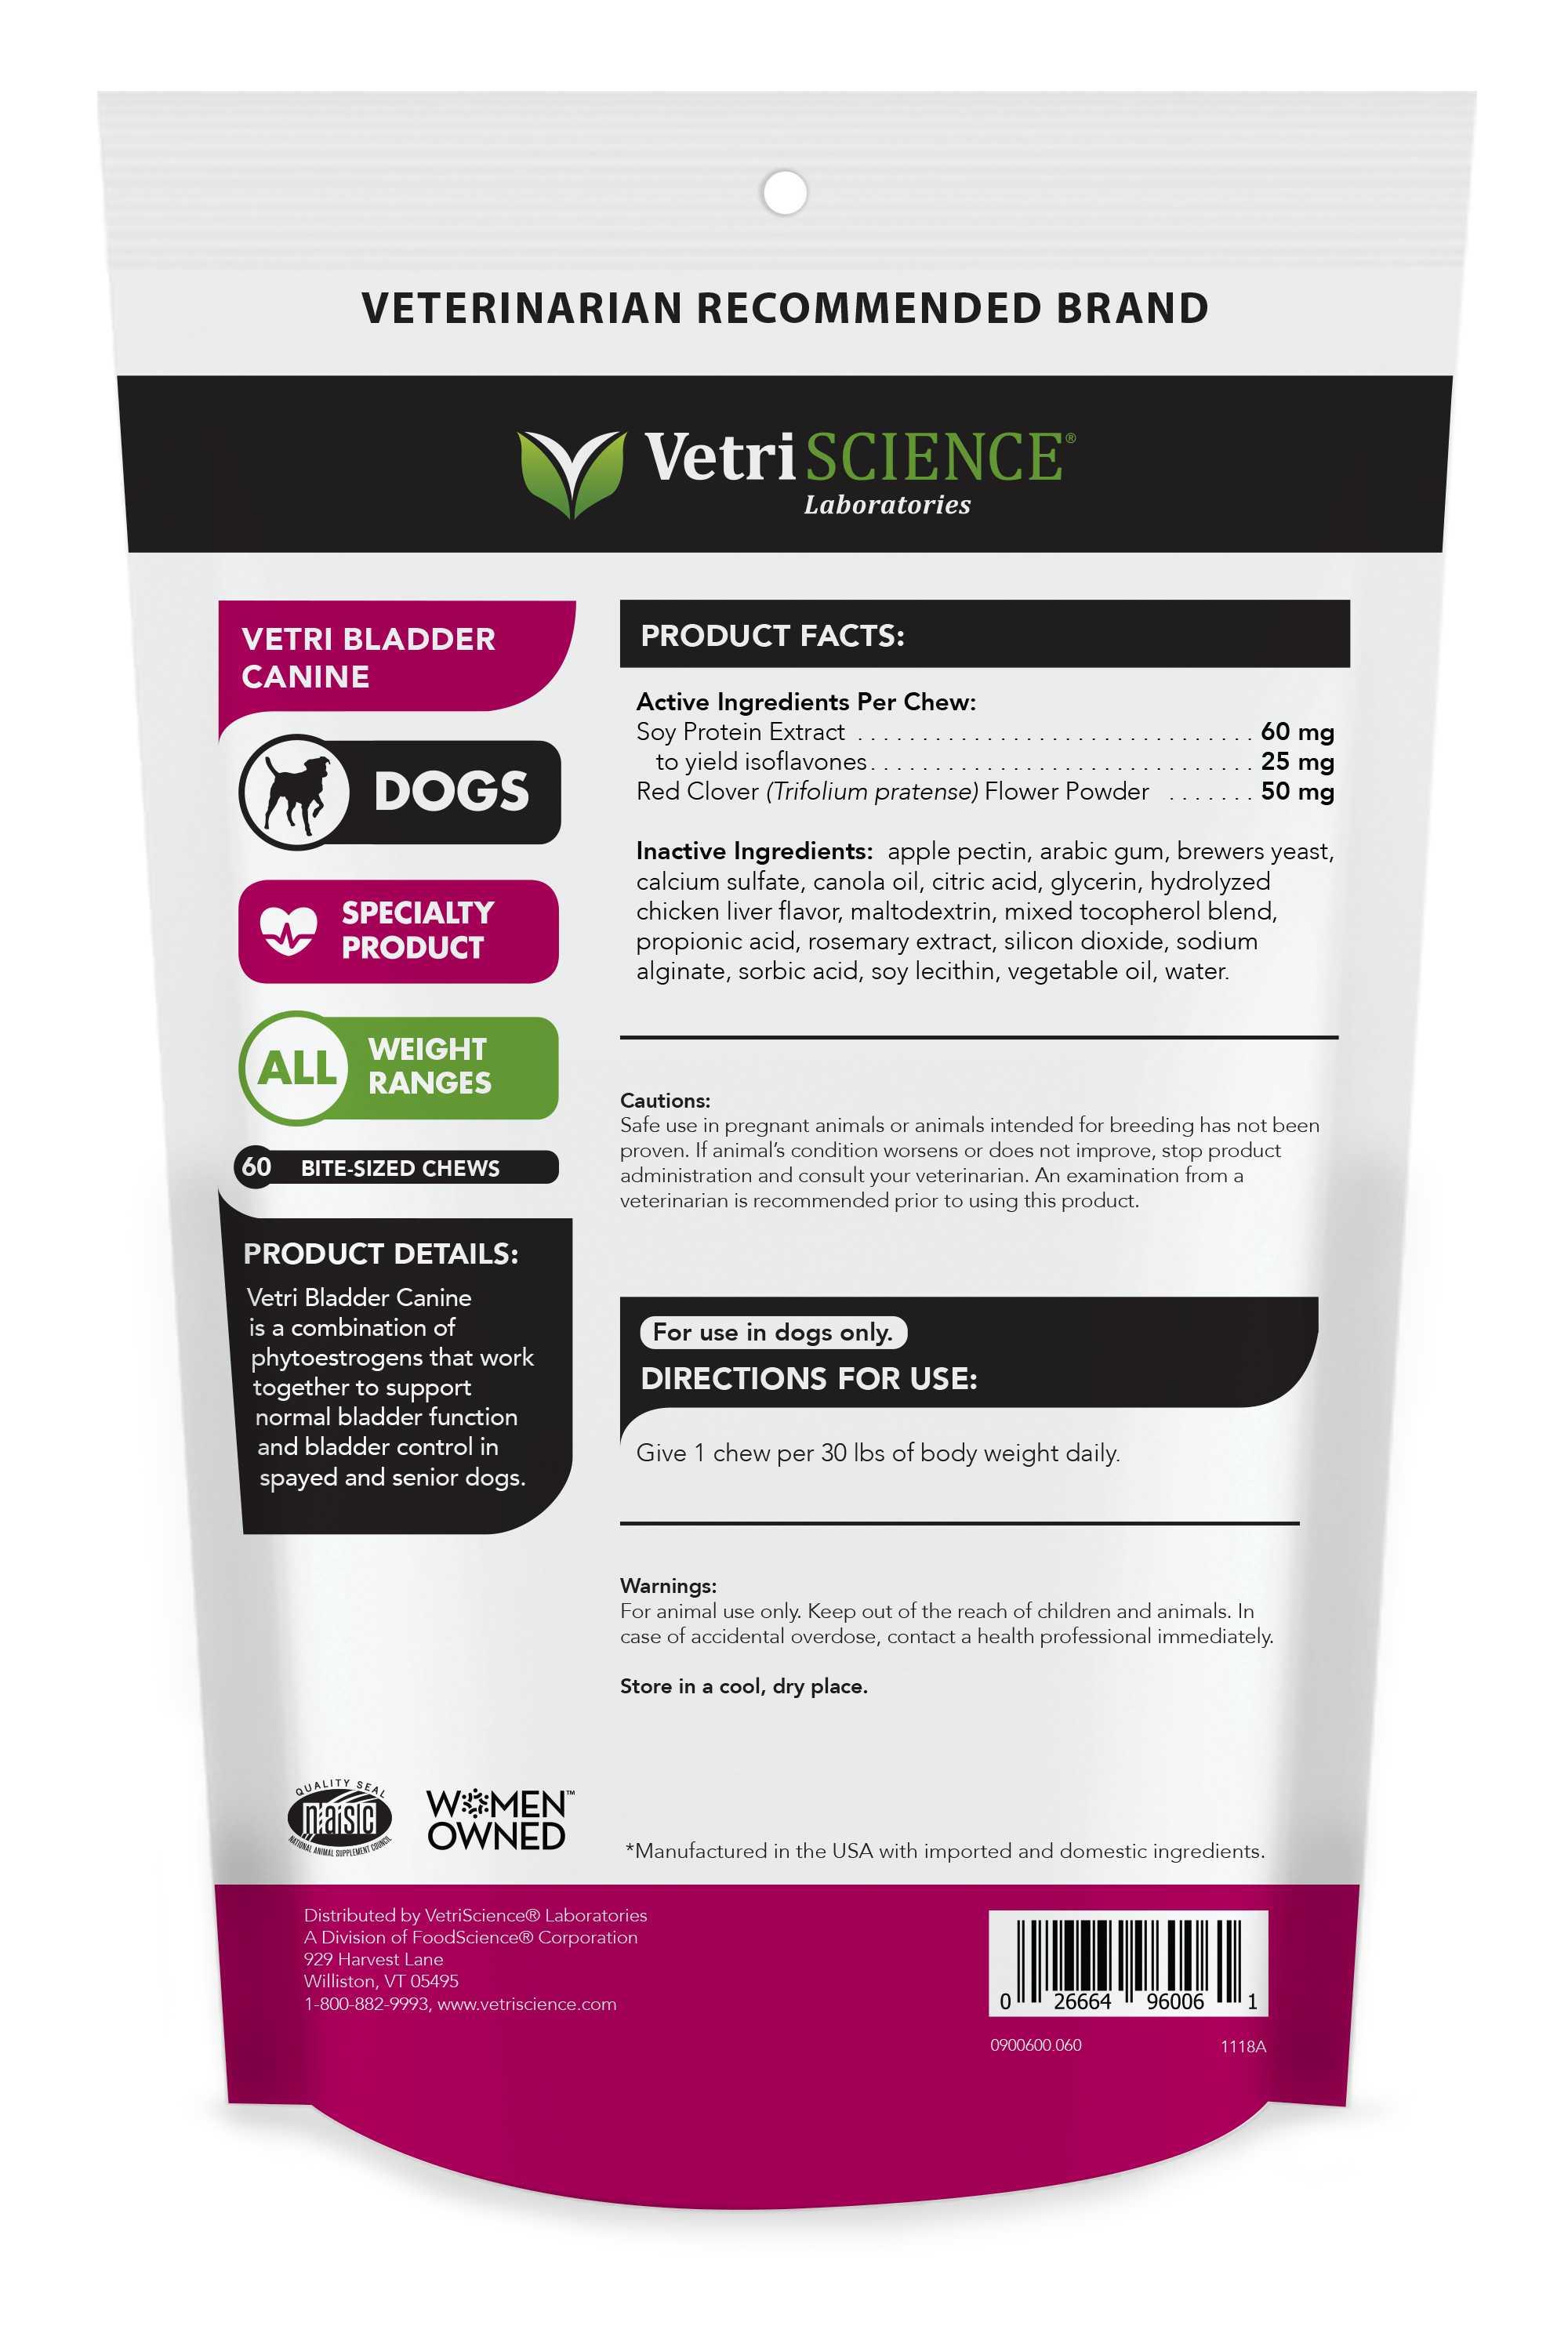 Vetri Bladder Canine - Product Details - Supp. for dog leaking urine